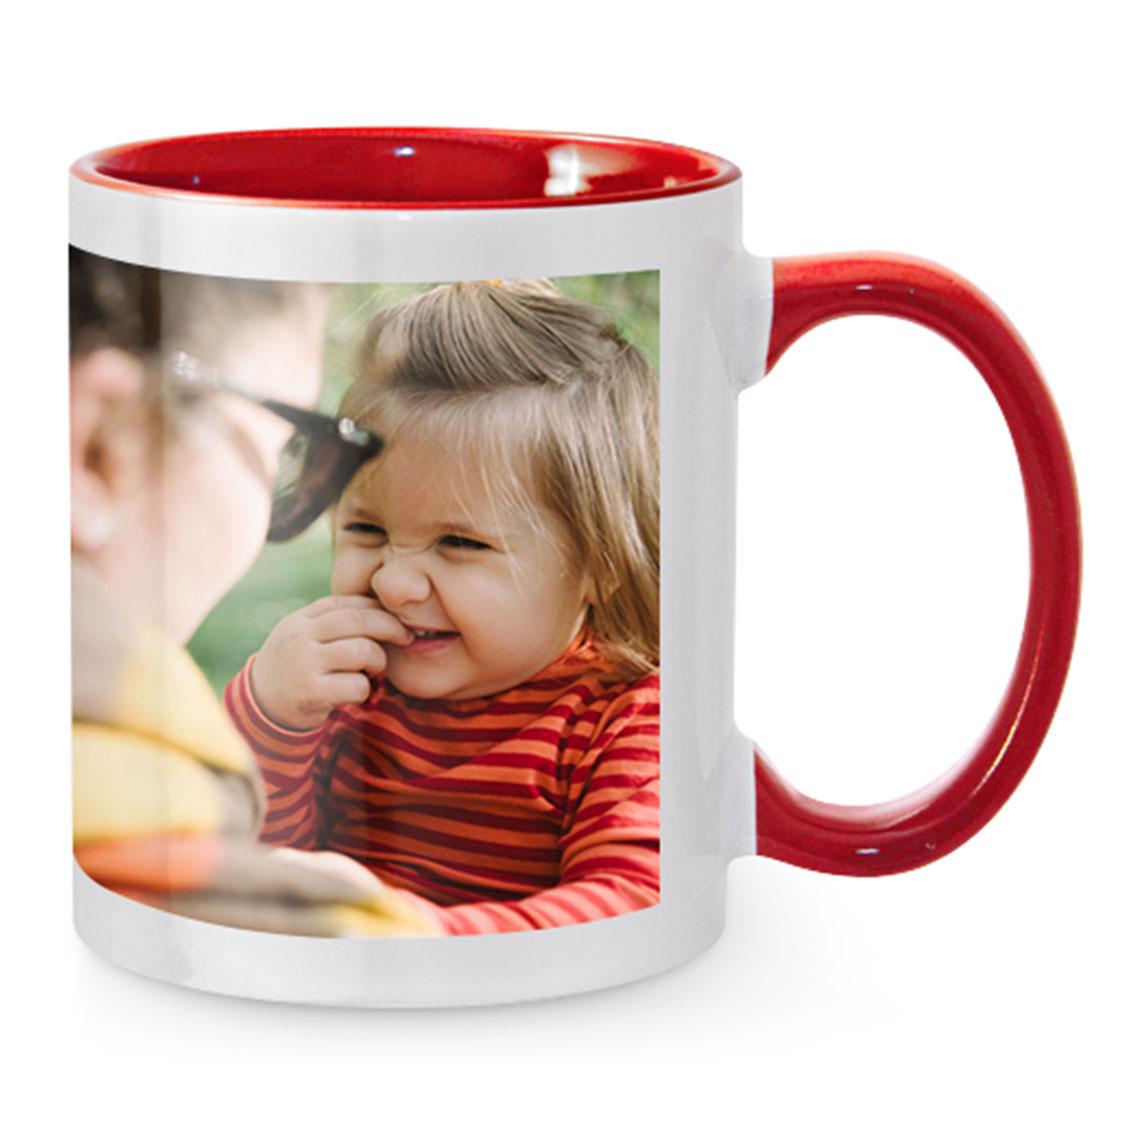 Red Colored Mug Full Image   Coloured Mugs   Mugs   Gifts   Snapfish NZ